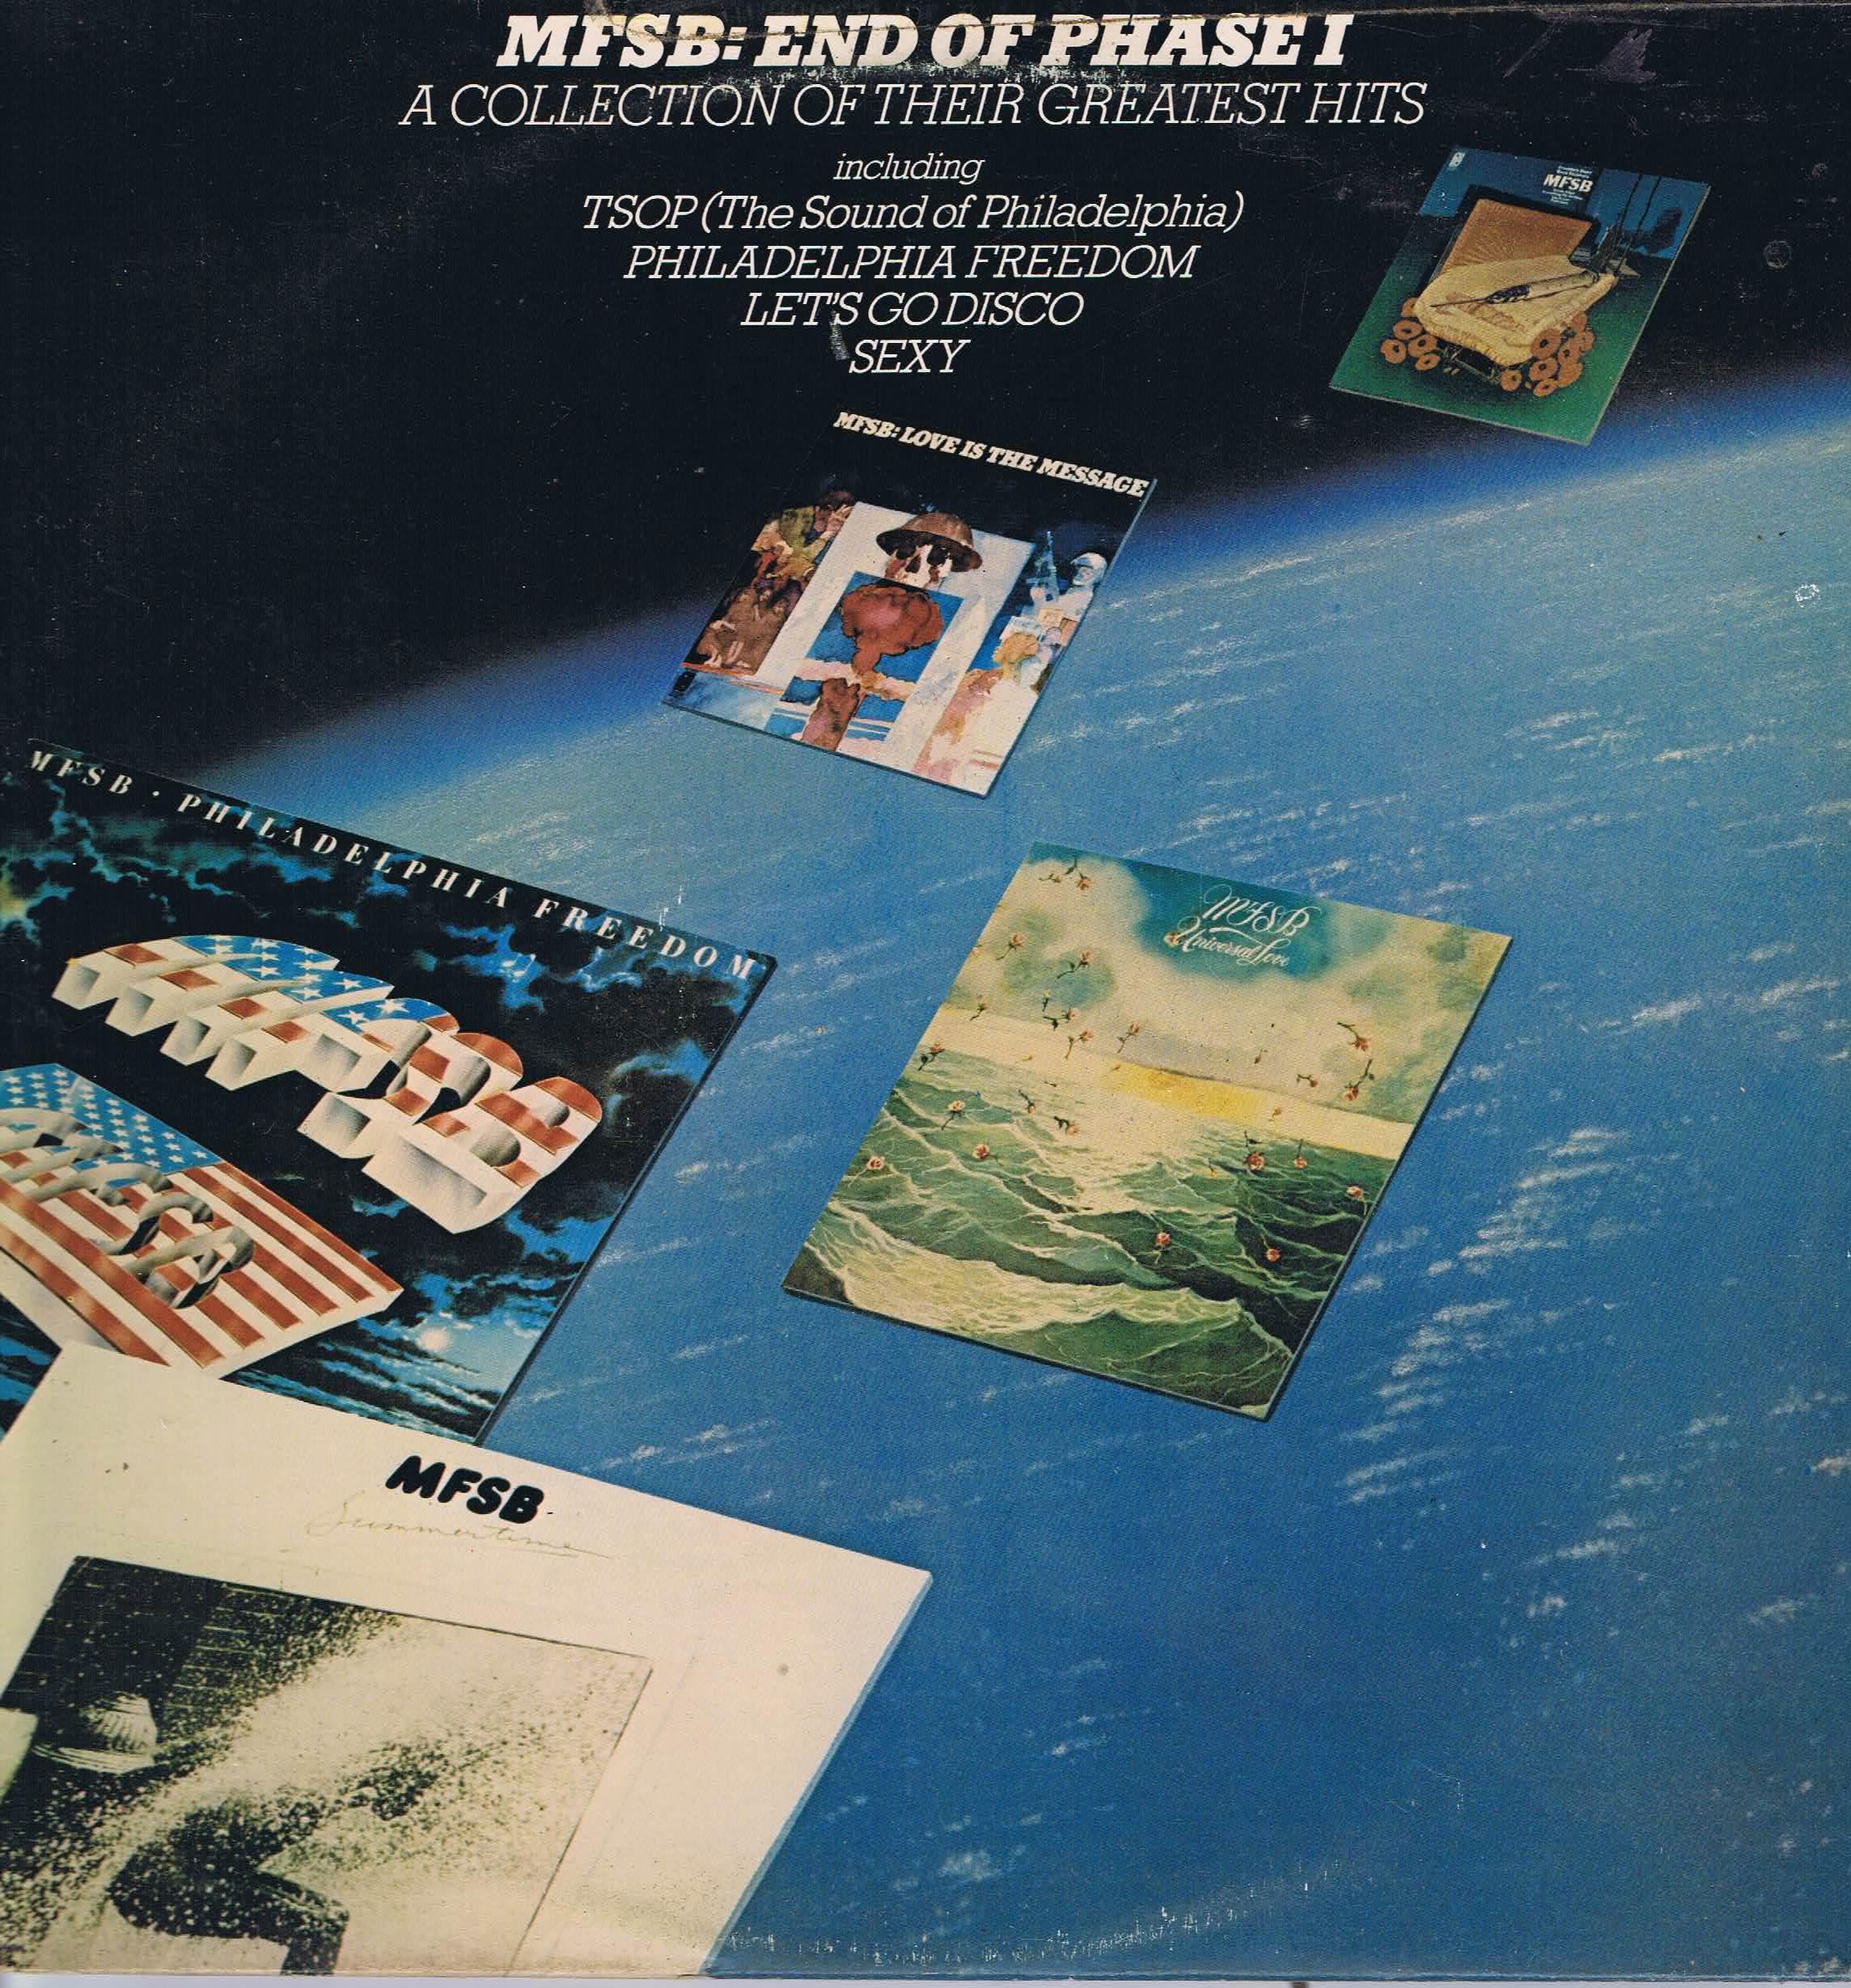 MFSB - End Of Phase I - PIR 81889 - LP Record